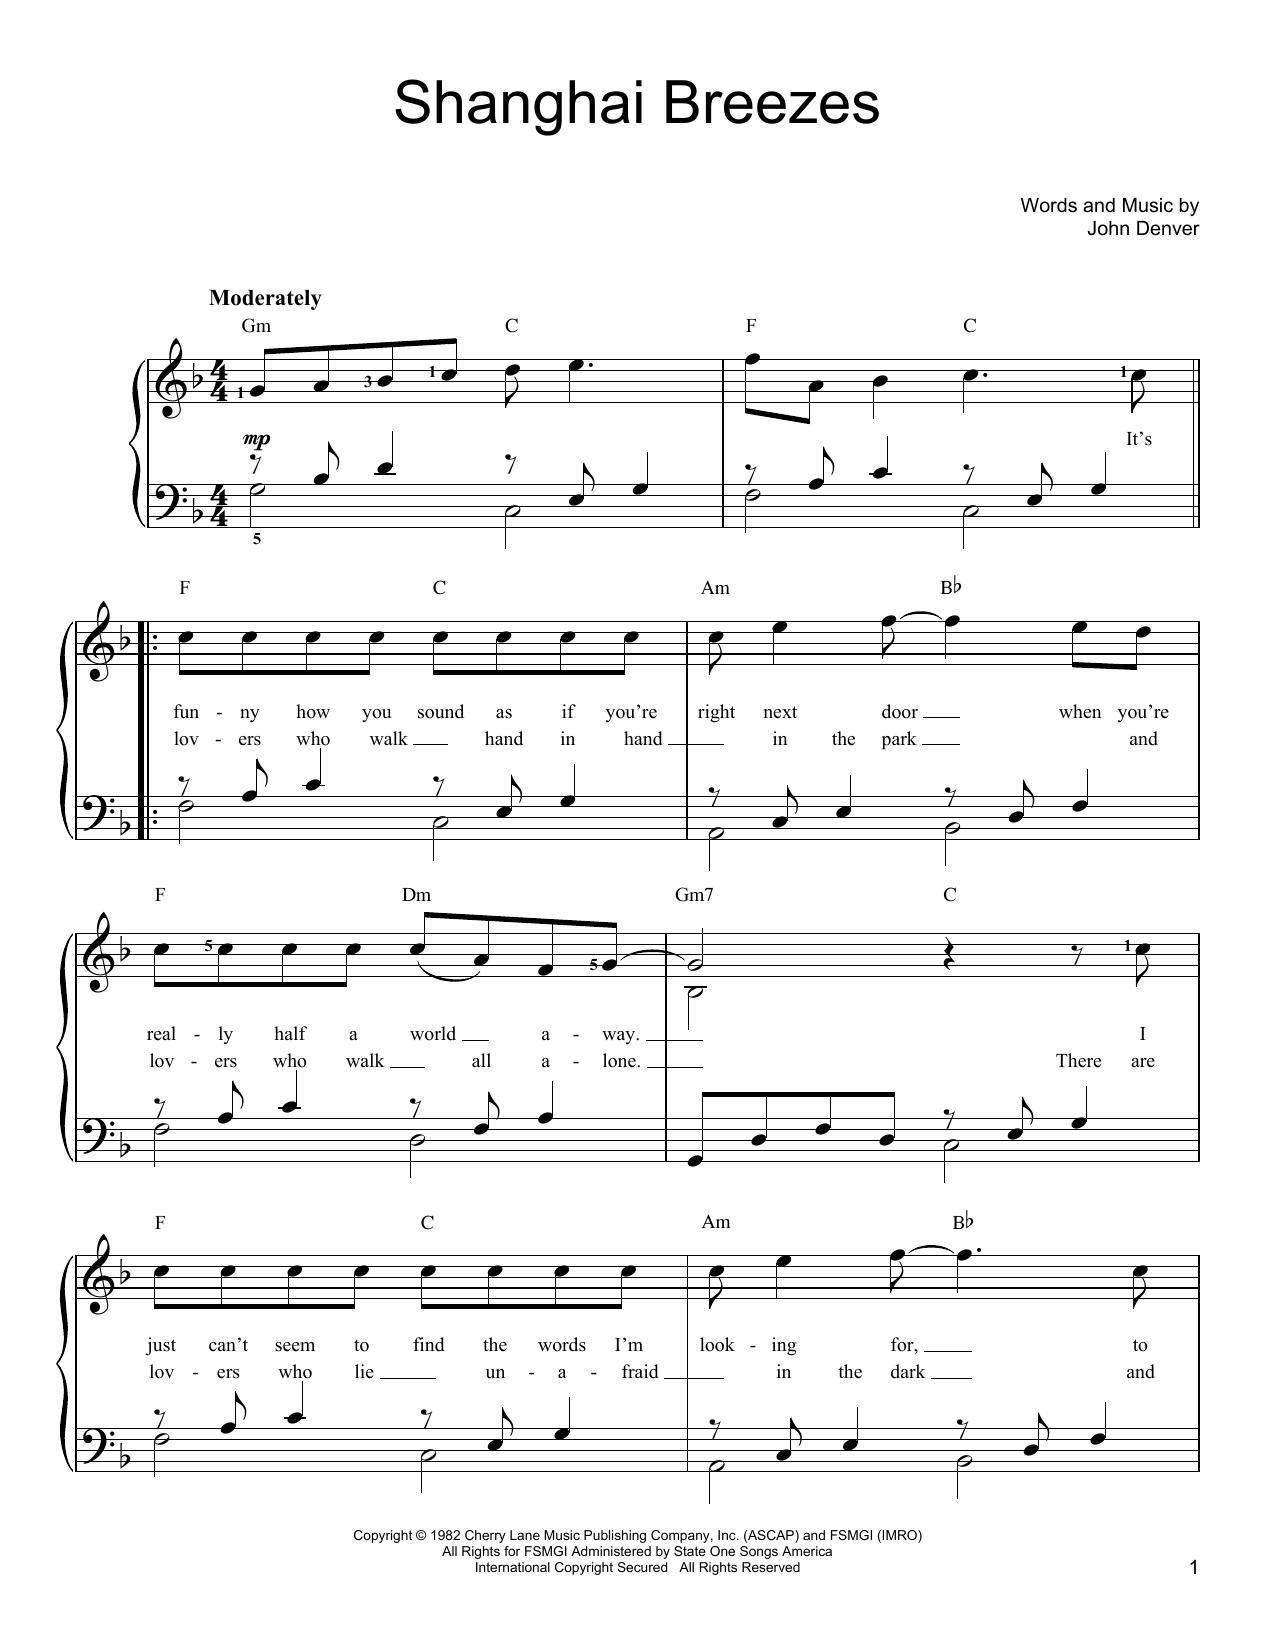 John Denver Shanghai Breezes sheet music notes and chords. Download Printable PDF.